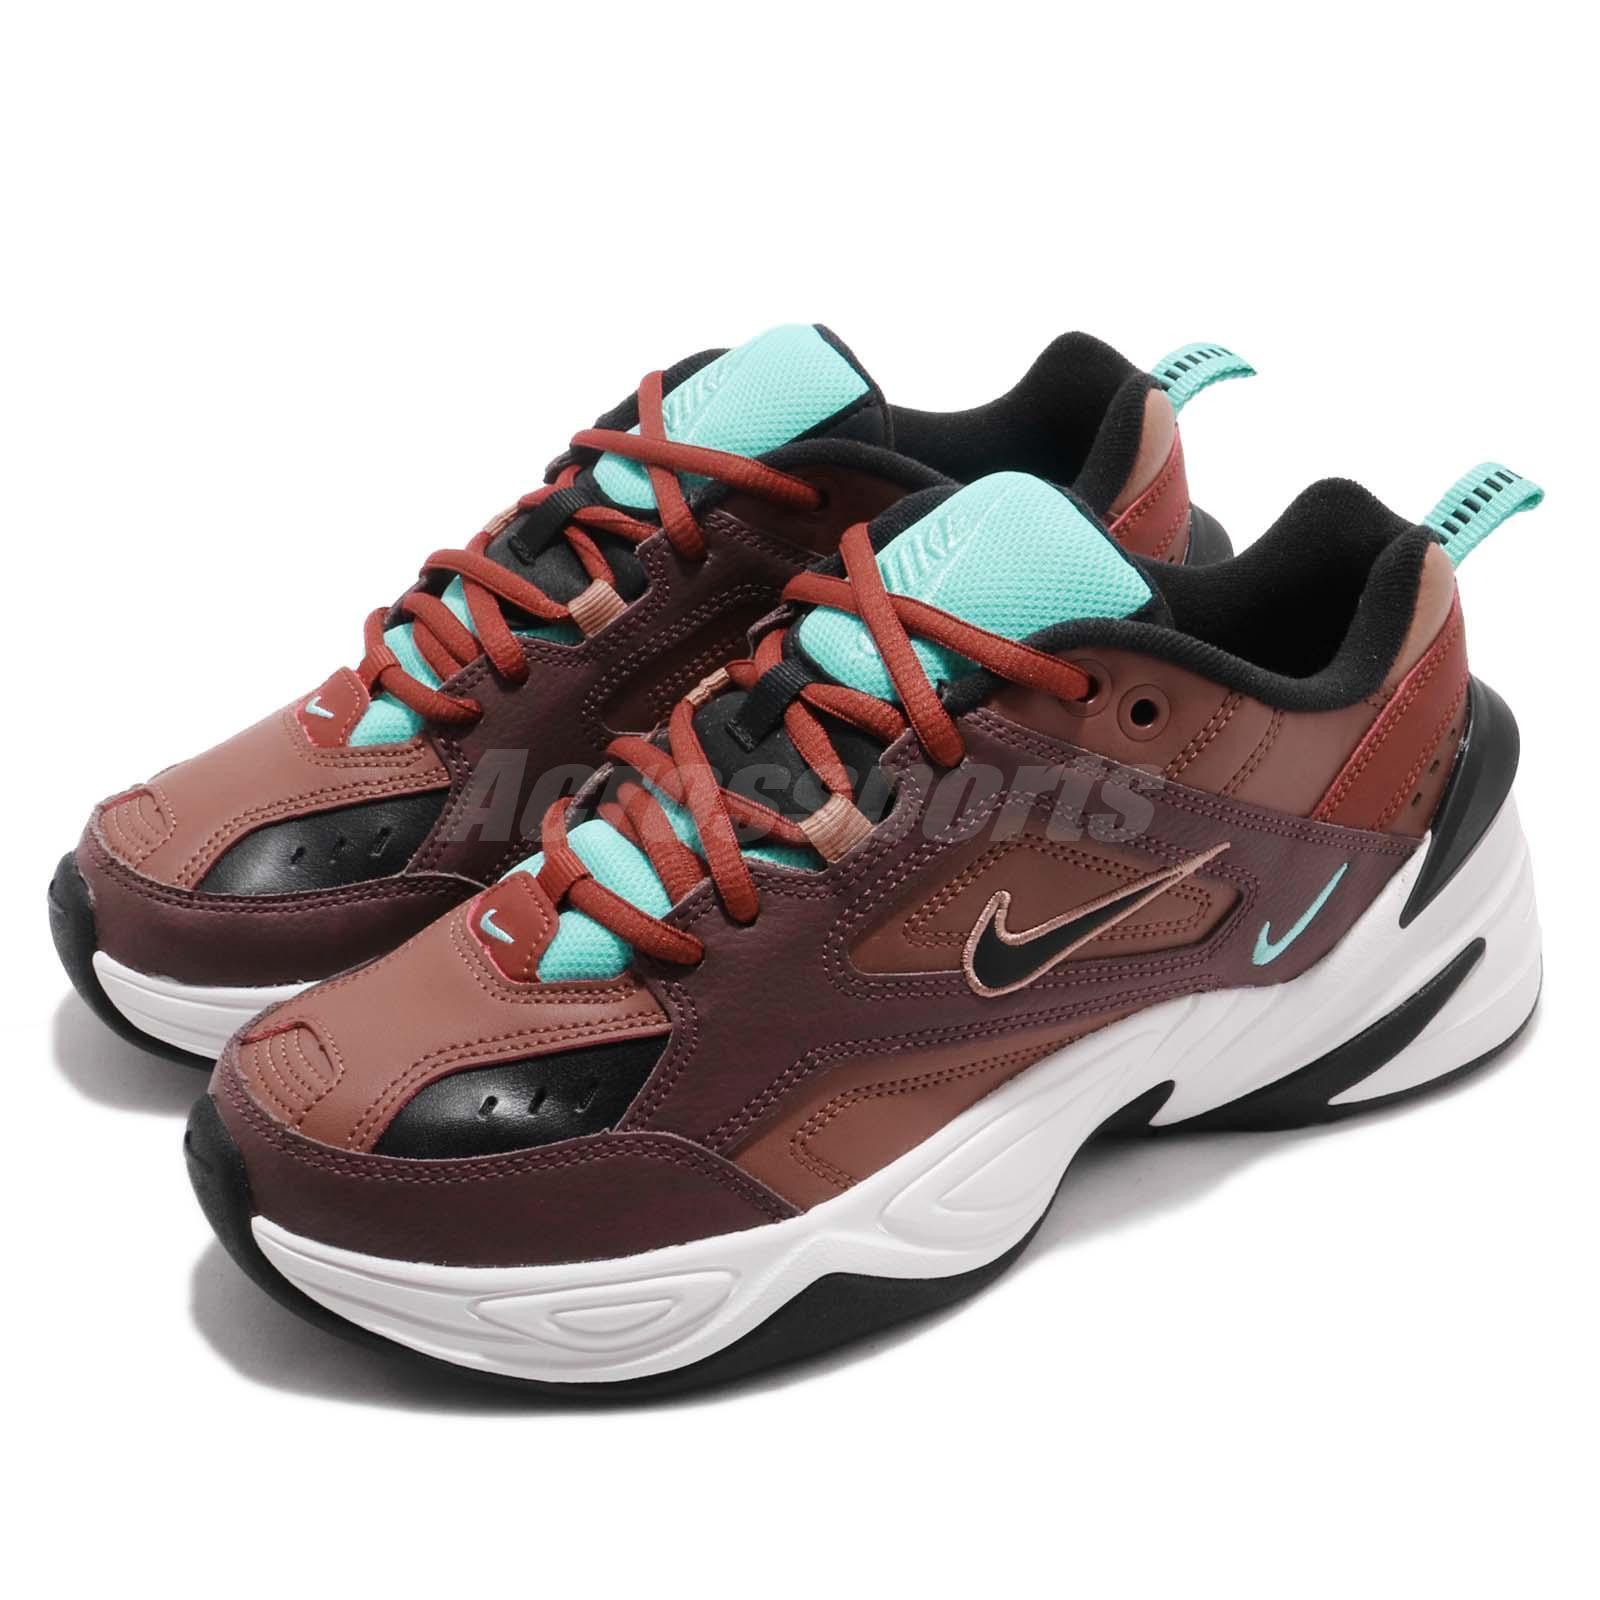 Nike Wmns M2K Tekno Mahogany Mink Black Women Daddy shoes Sneakers AO3108-200